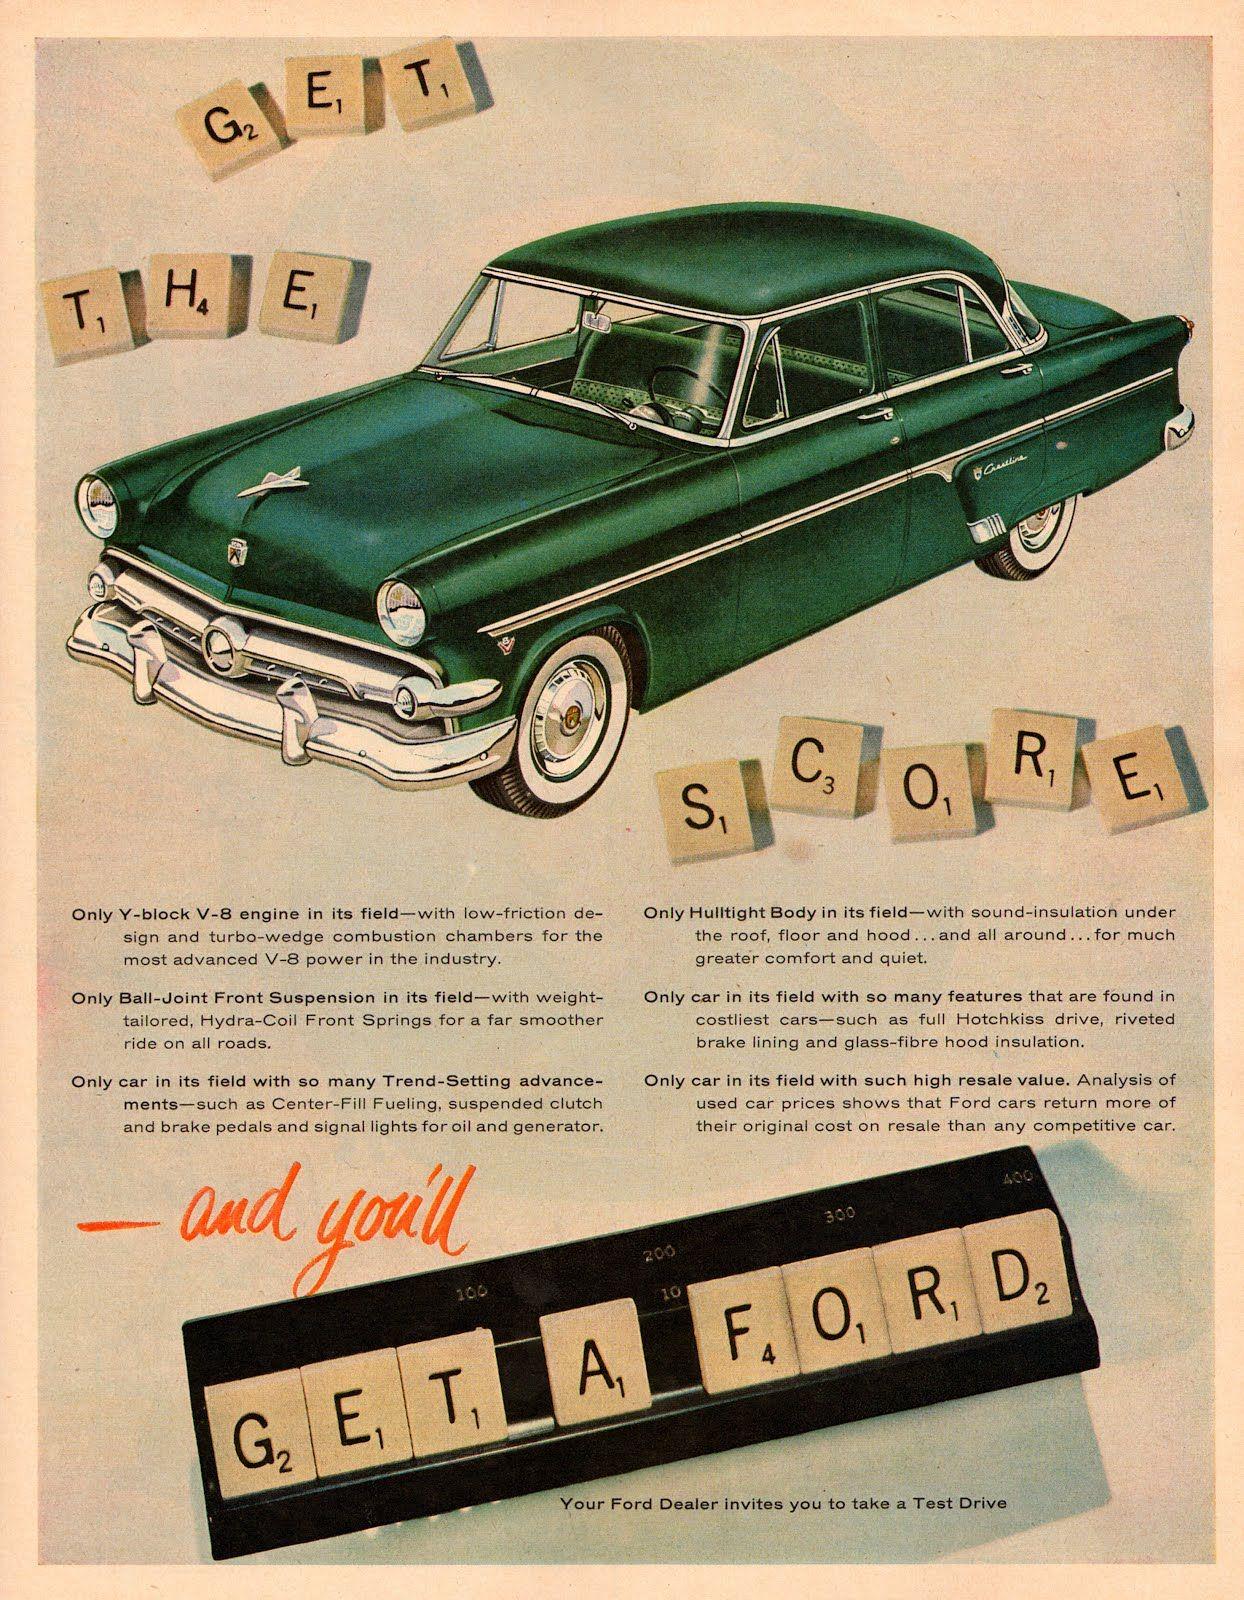 car ads uk cars | Neat Stuff Blog: Vintage Car Ads | Retro ads ...